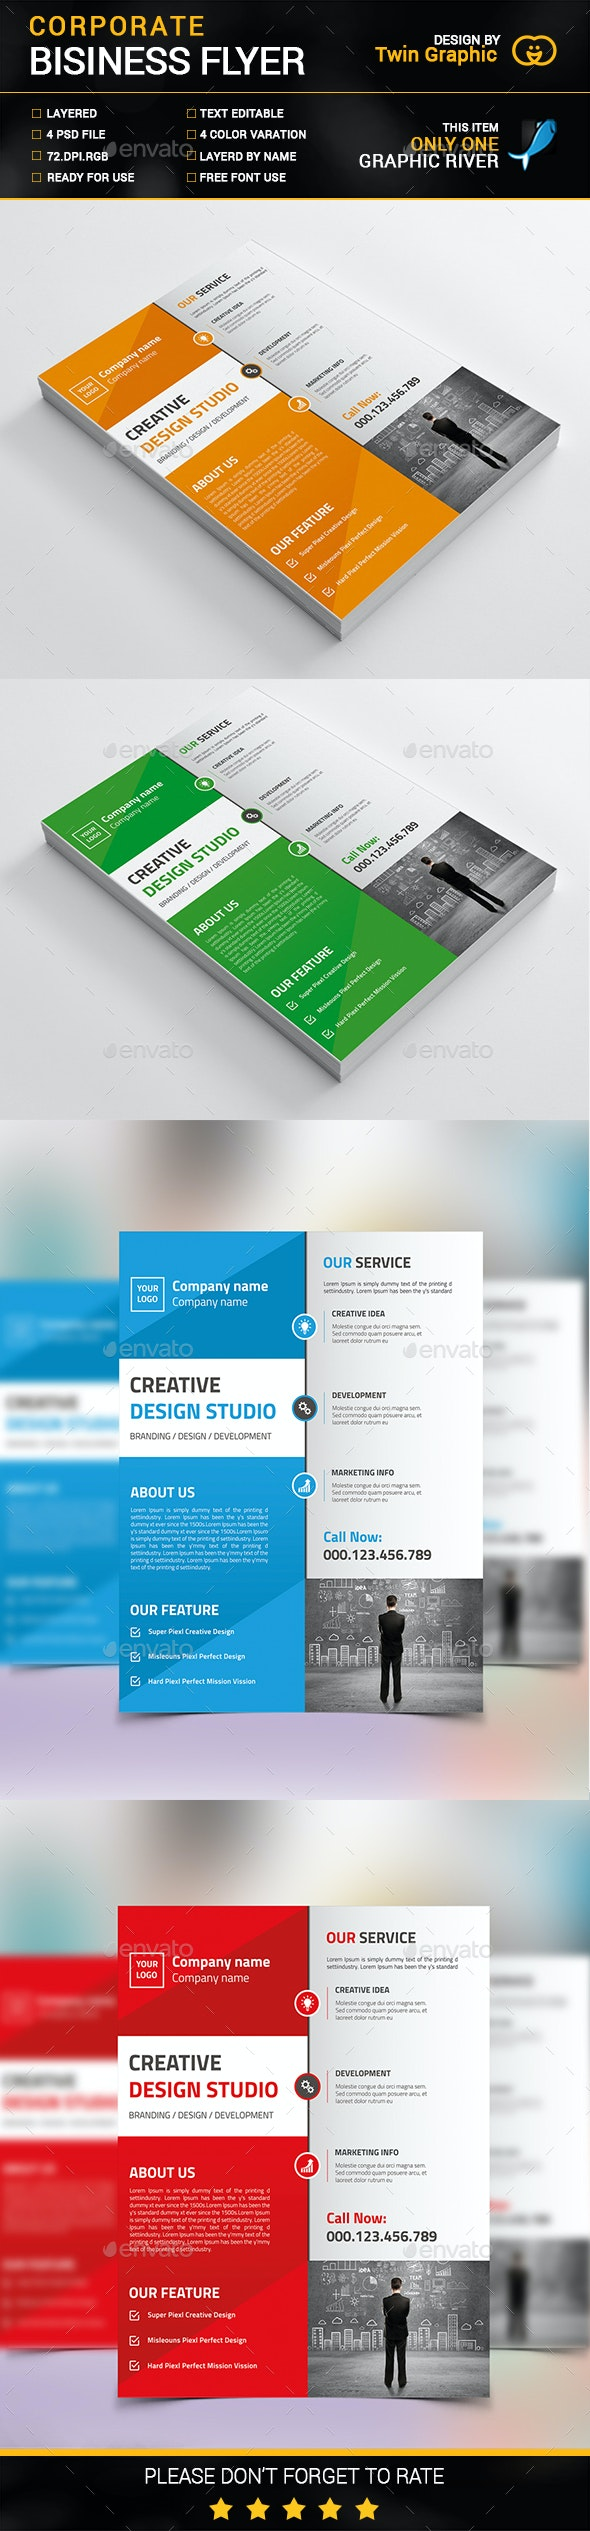 Corporate Business Flyer Design - Corporate Flyers